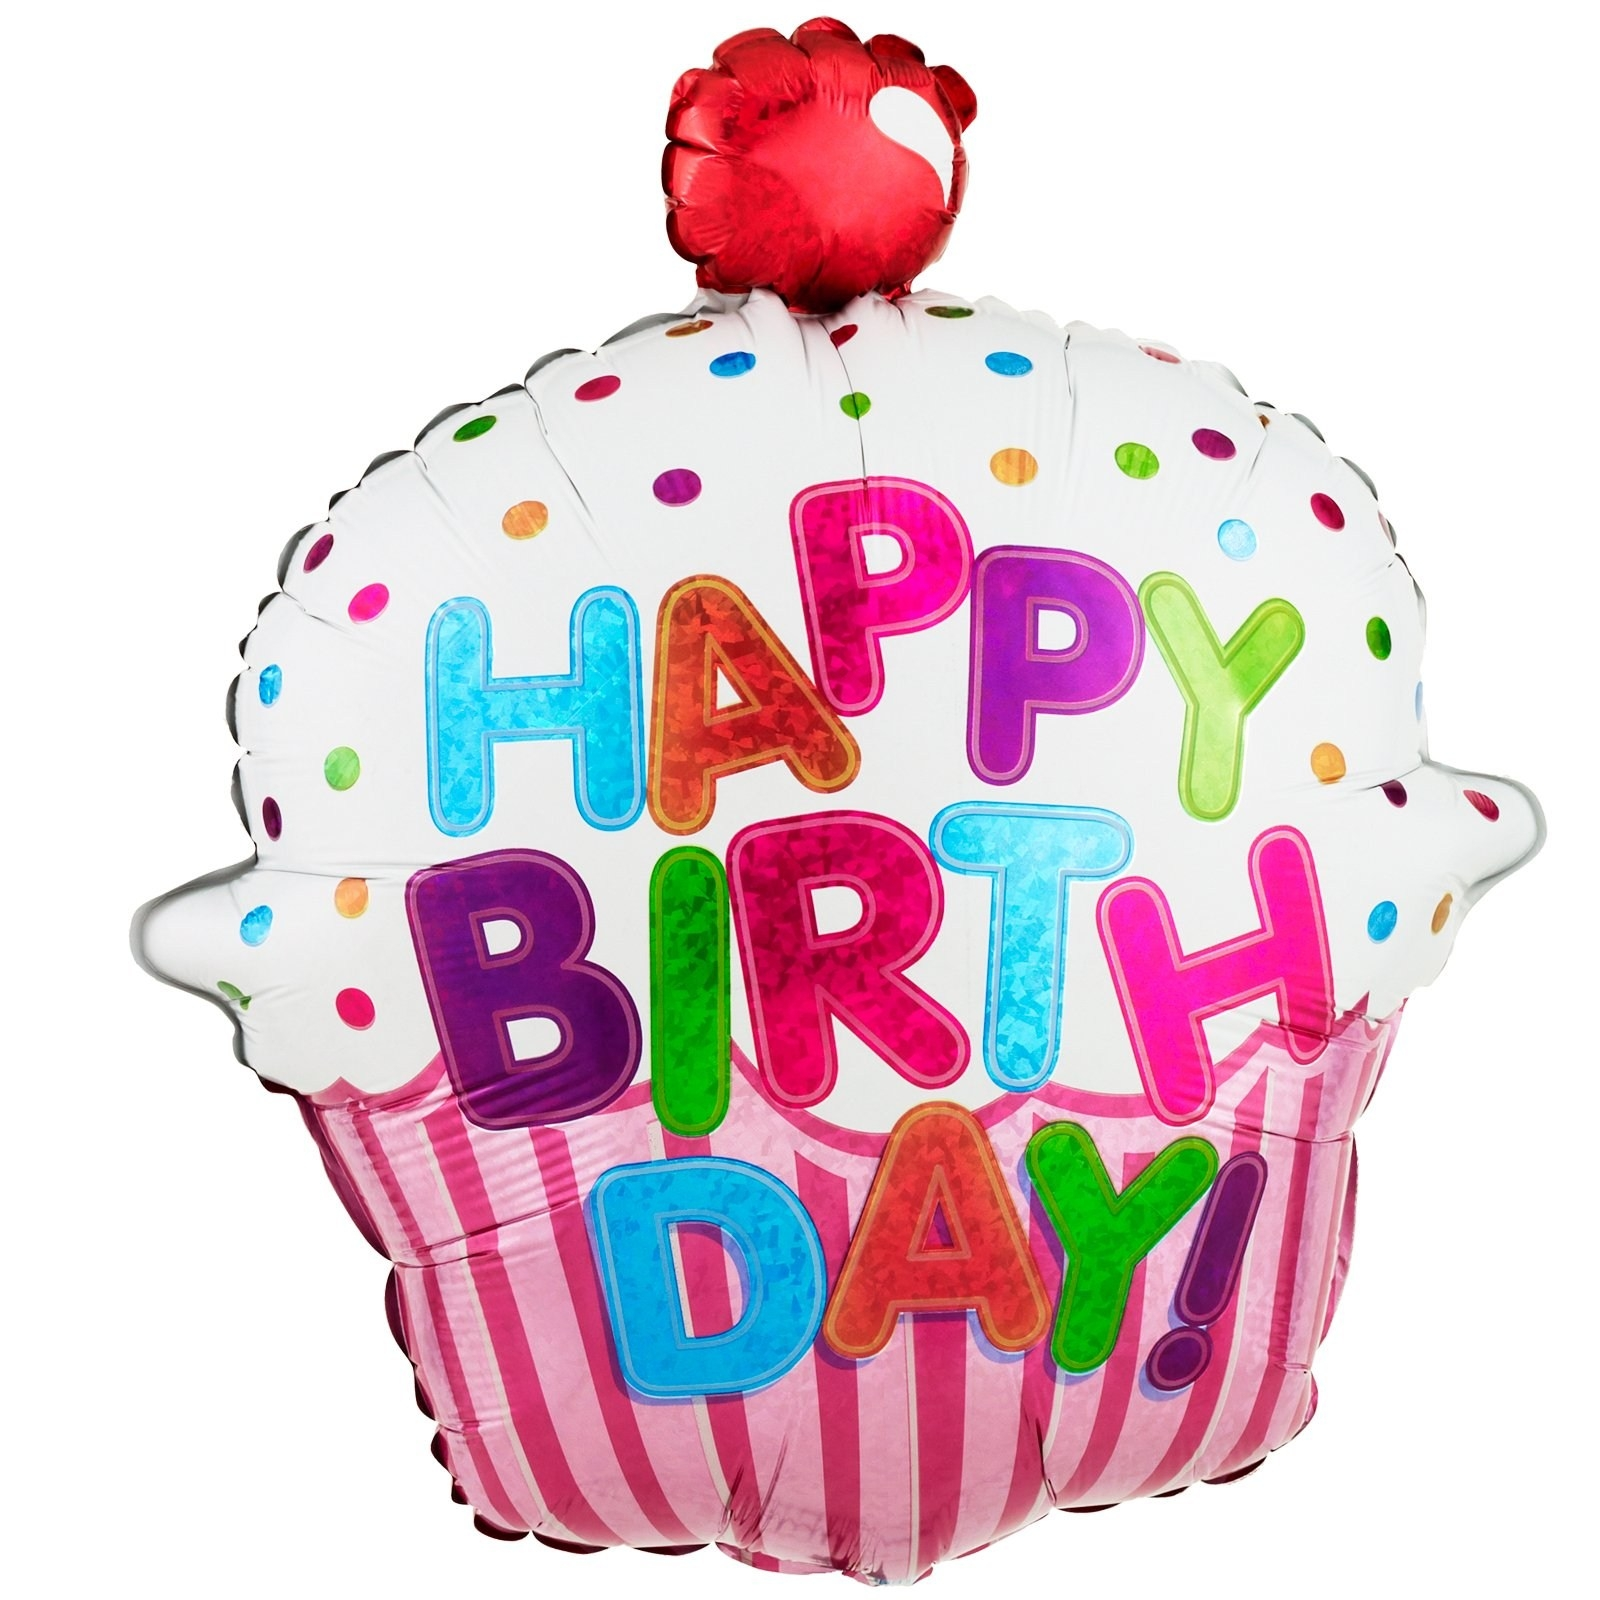 1600x1600 Happy Birthday Cupcake Clip Art